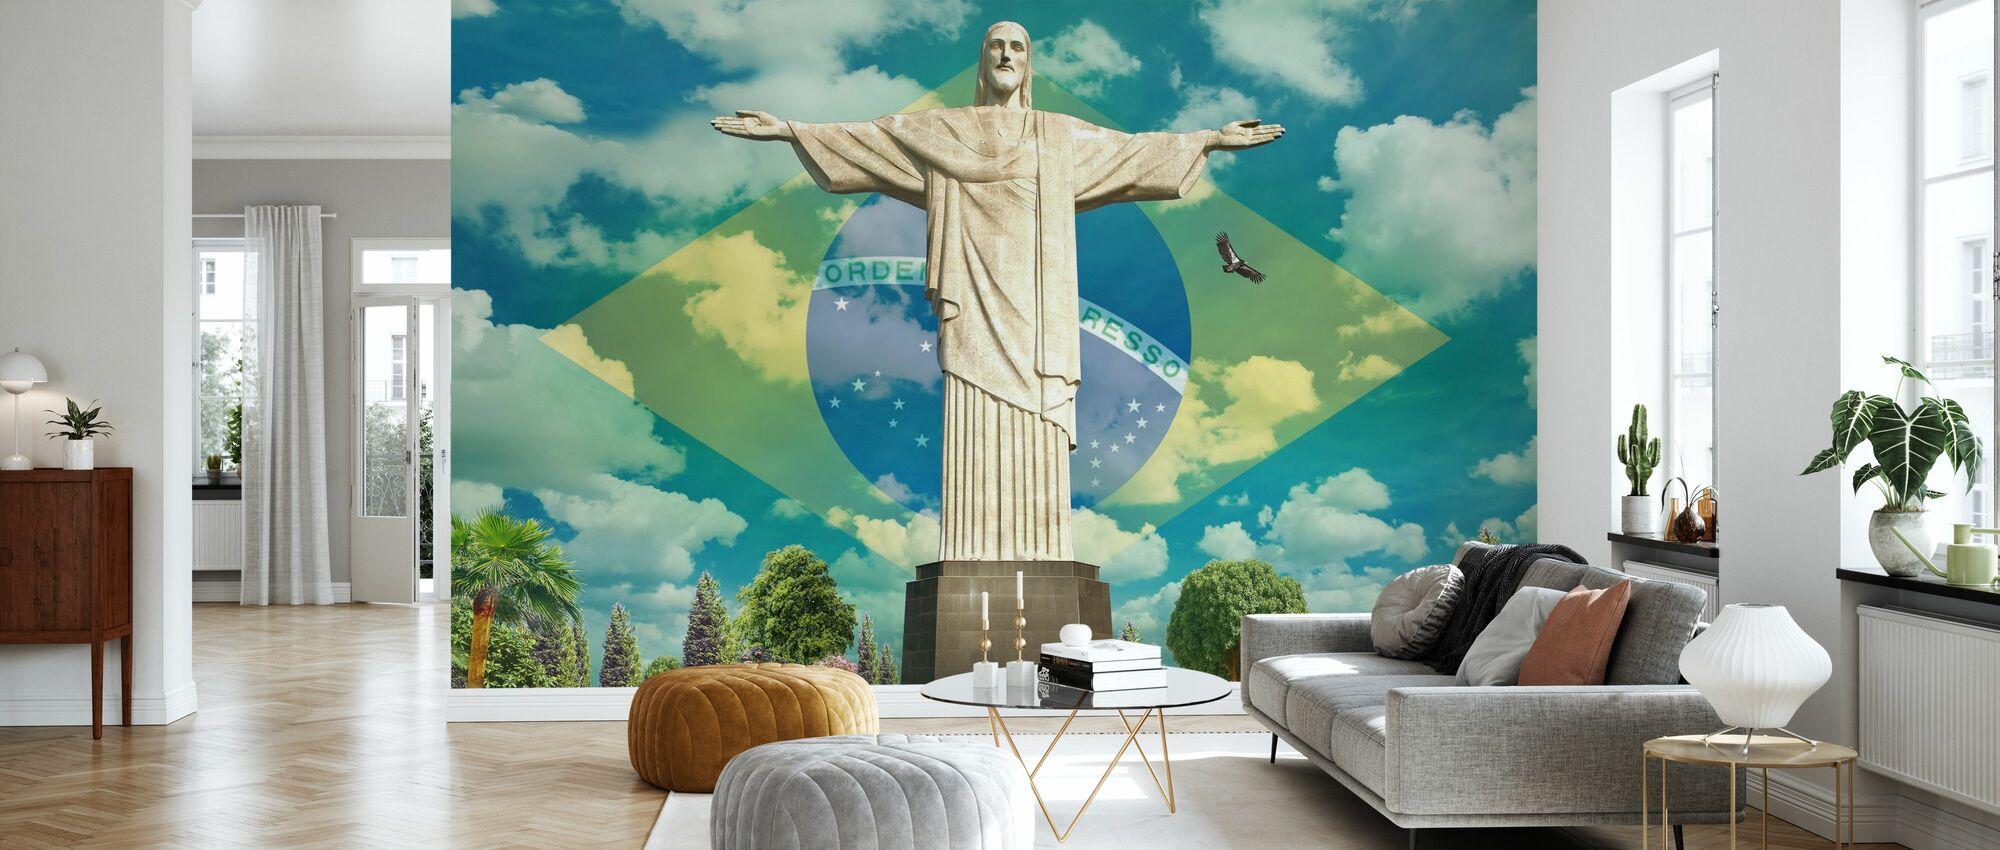 Jesus in Rio - Wallpaper - Living Room